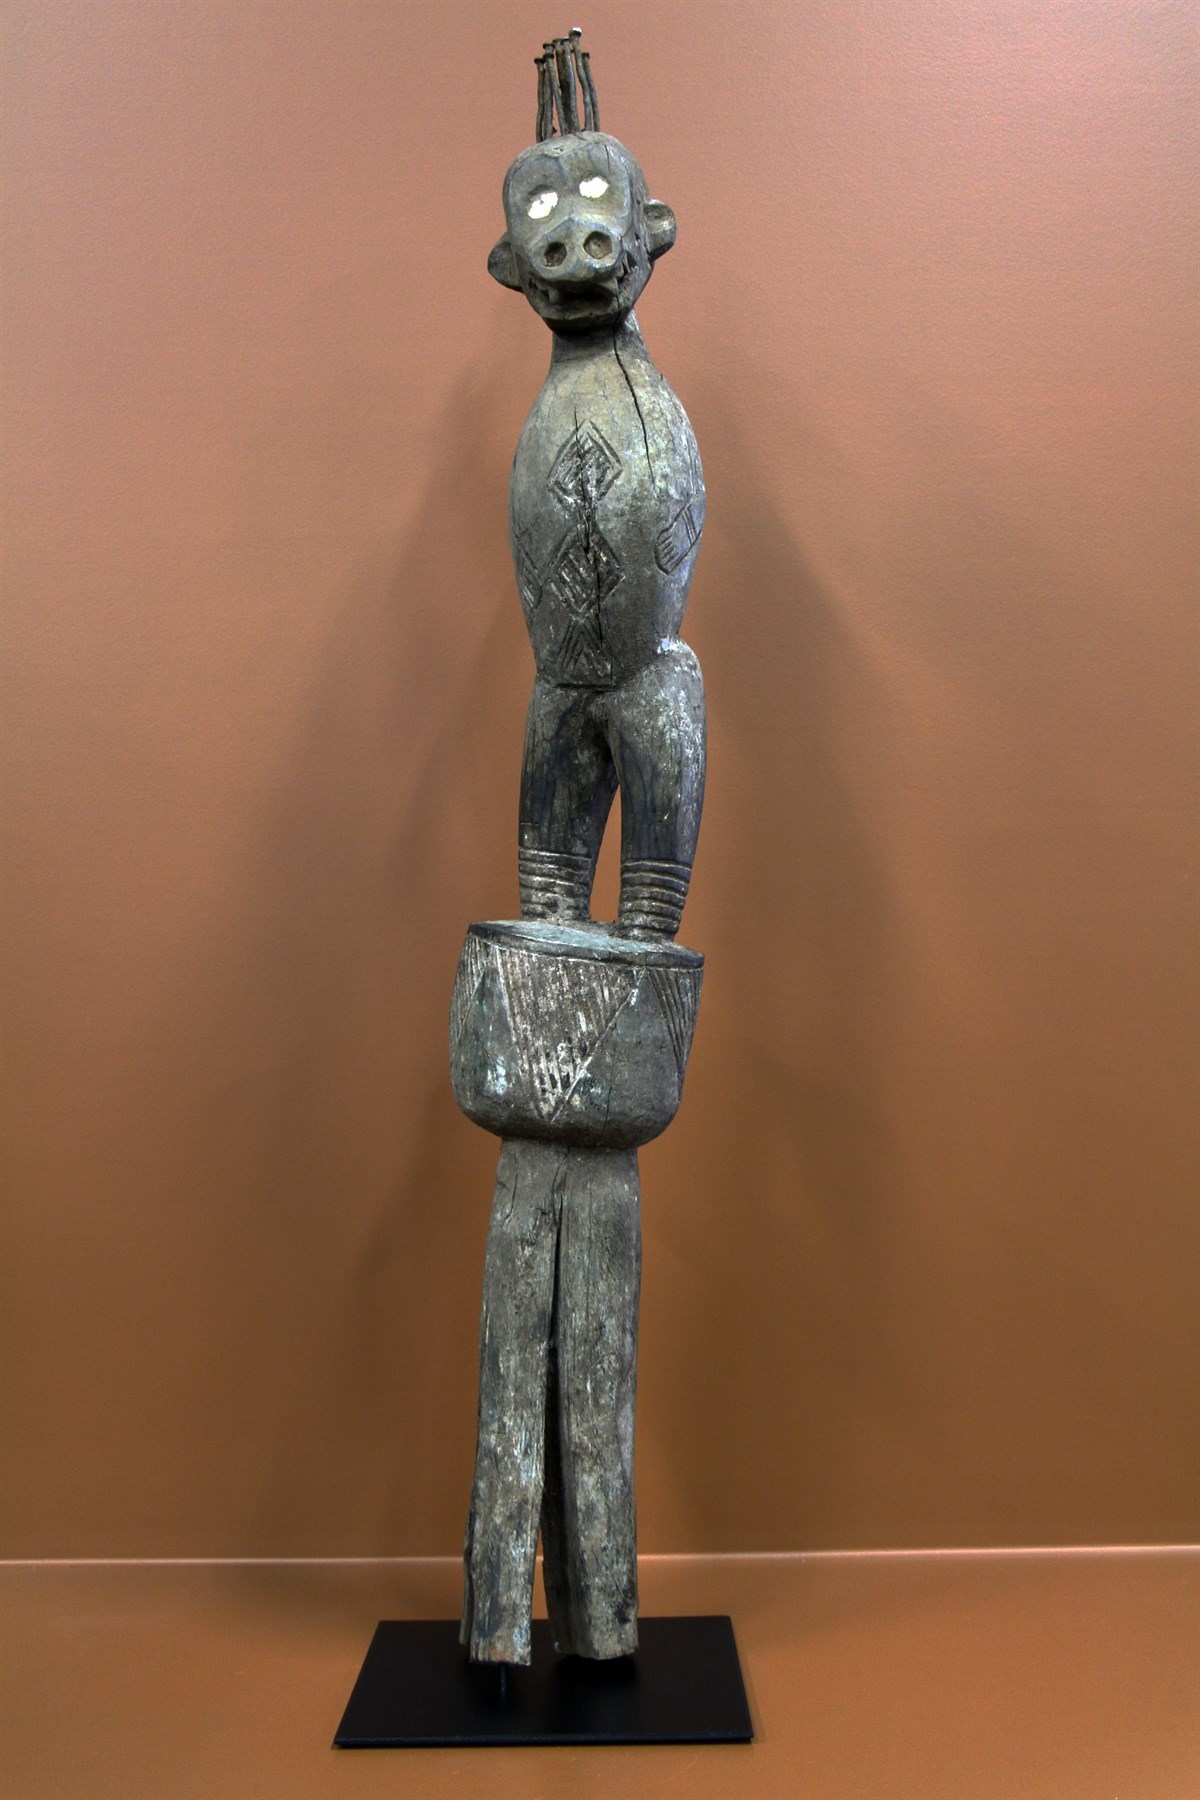 Poteau Boulou - Déco africaine - Art africain traditionnel